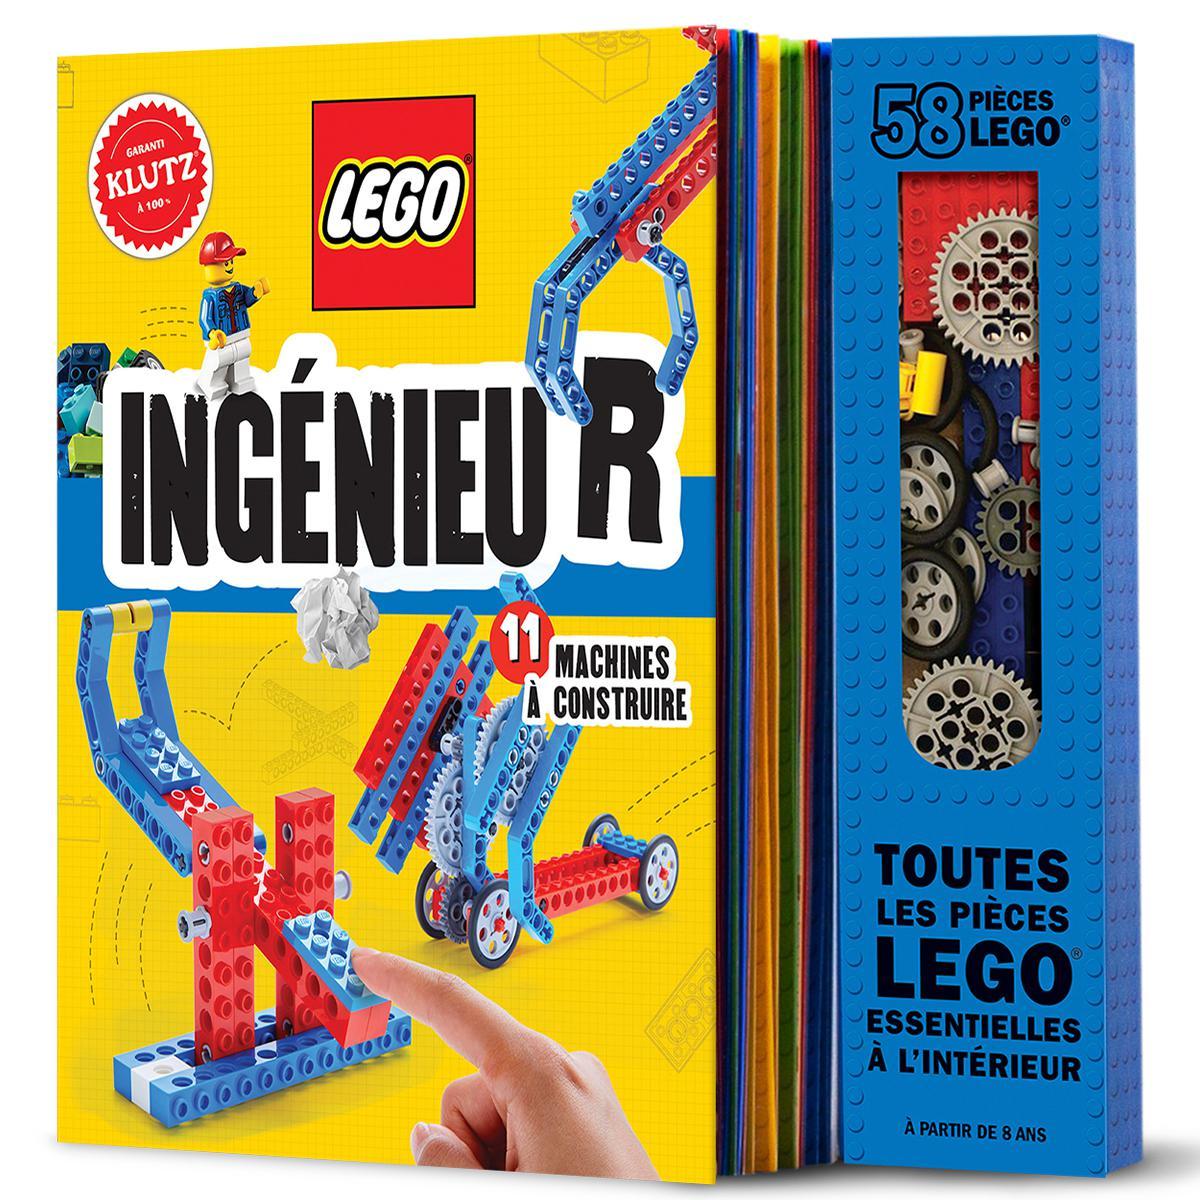 Klutz : LEGO® Ingénieur